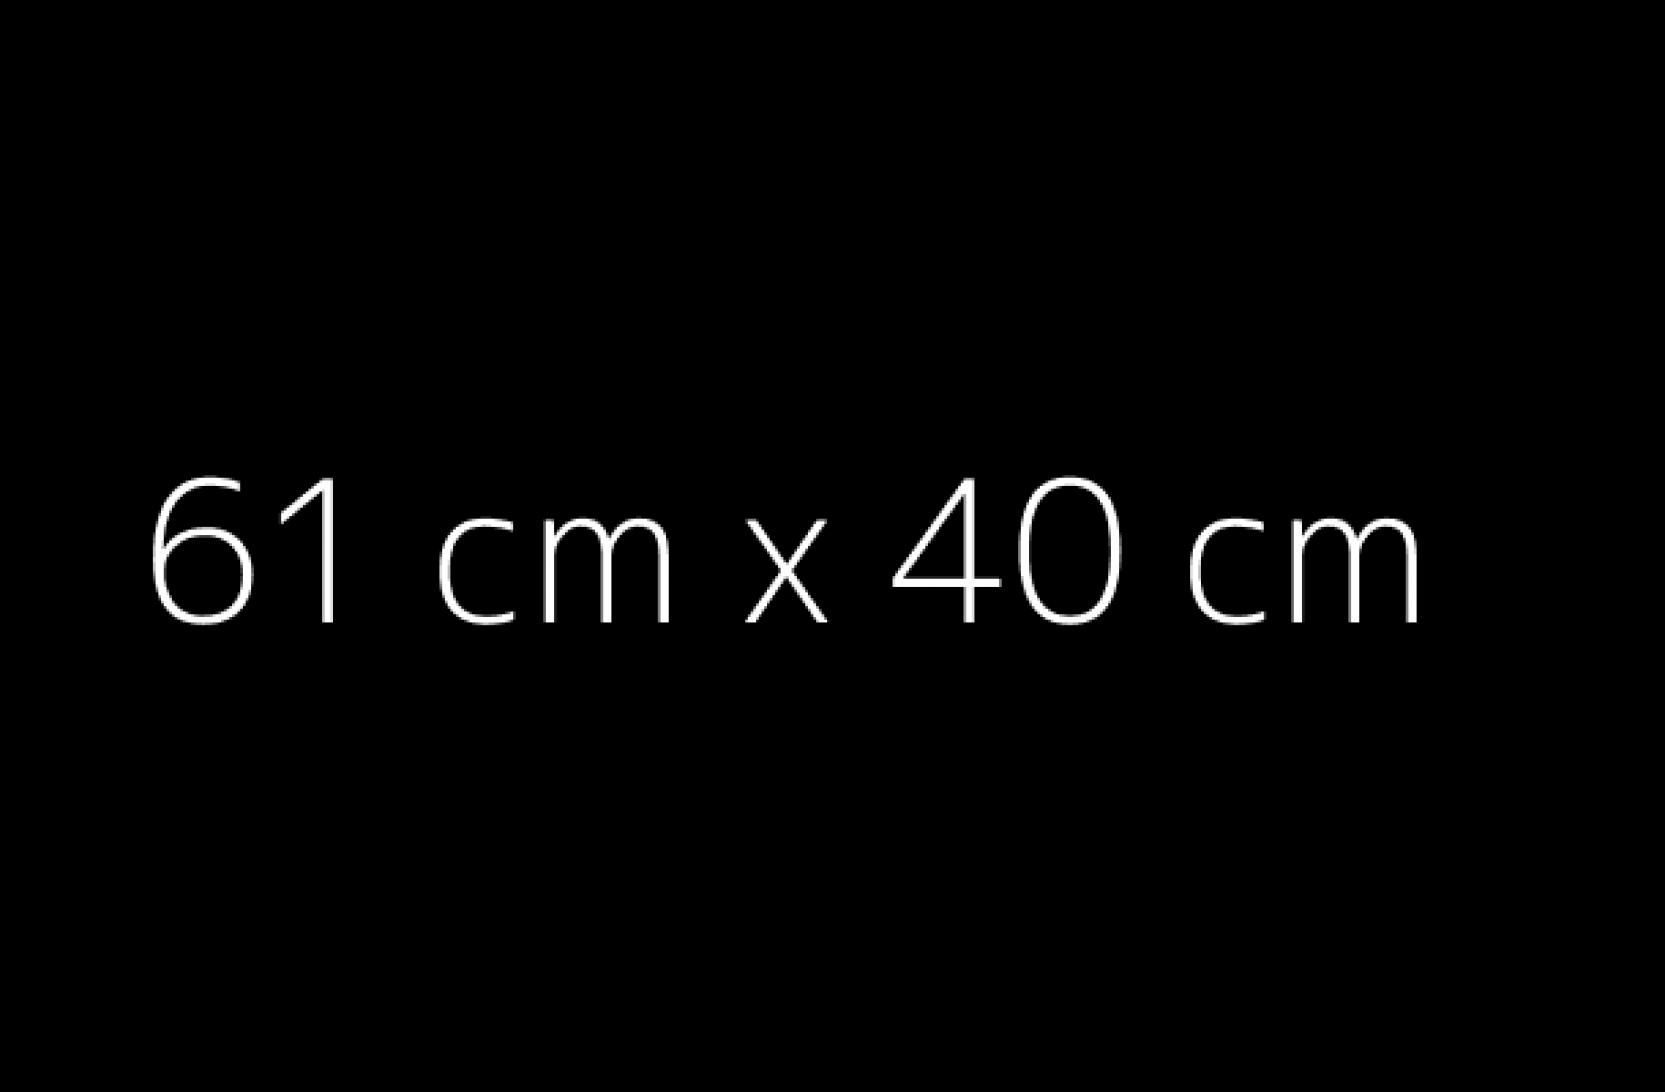 Reprodukcje format 61x 40